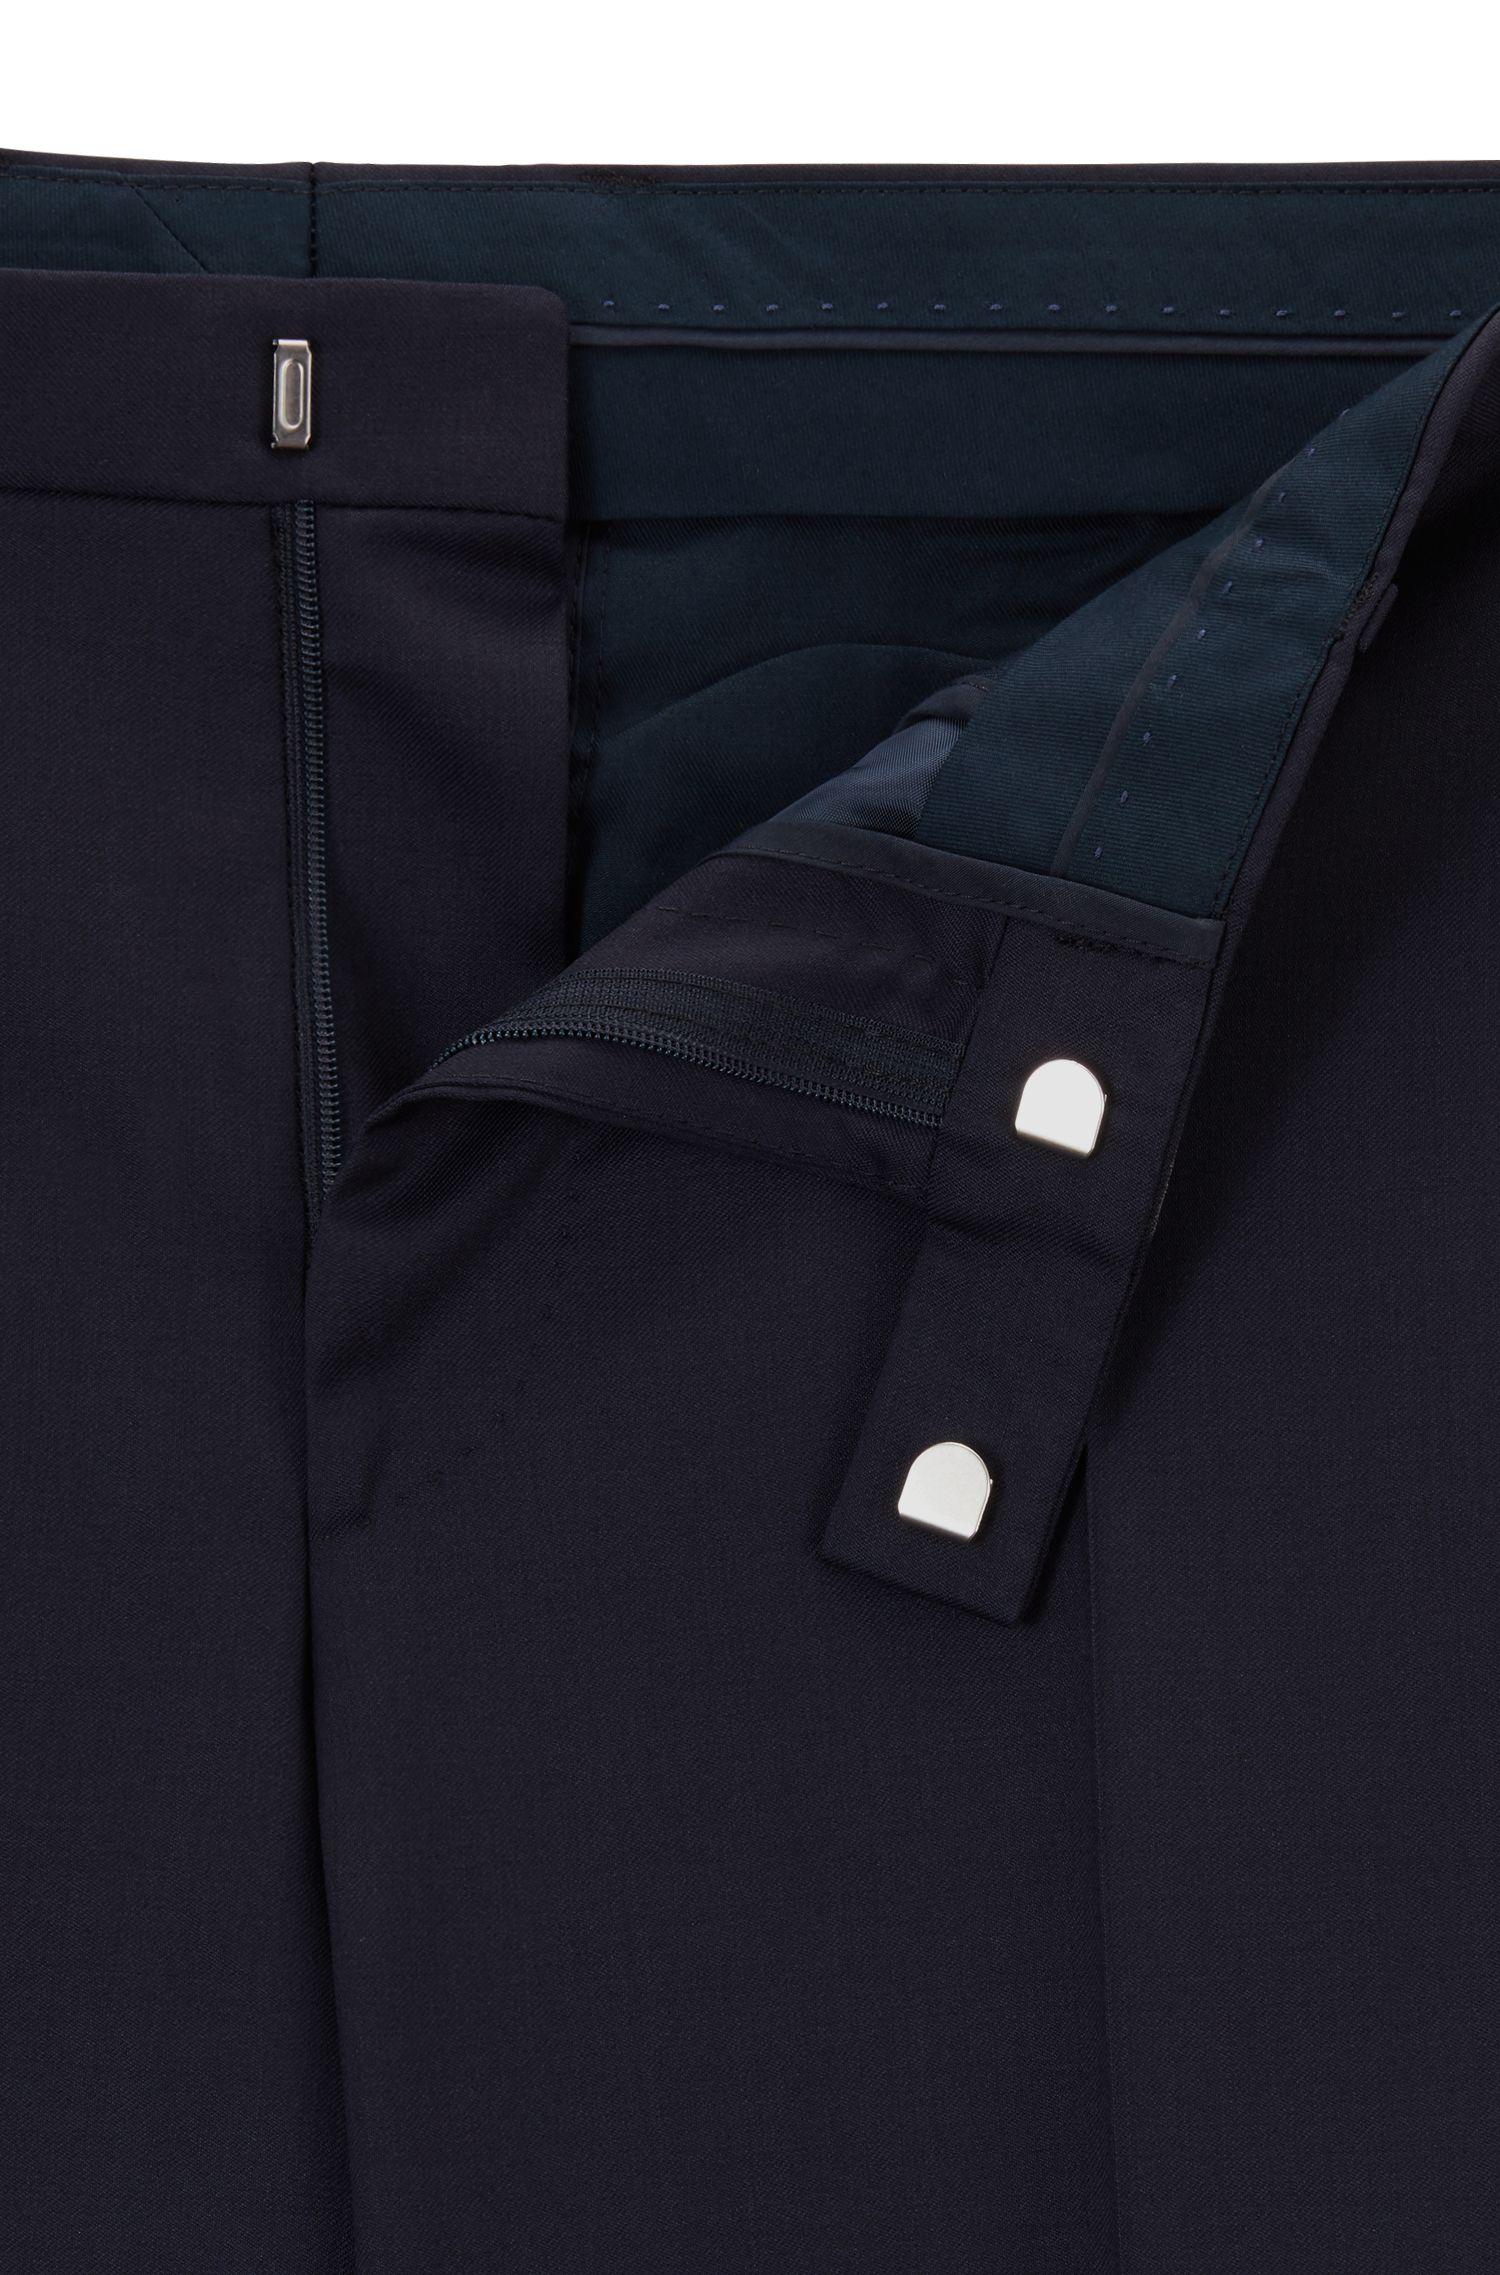 Virgin Wool Dress Pants, Regular Fit | Lenon CYL, Dark Blue